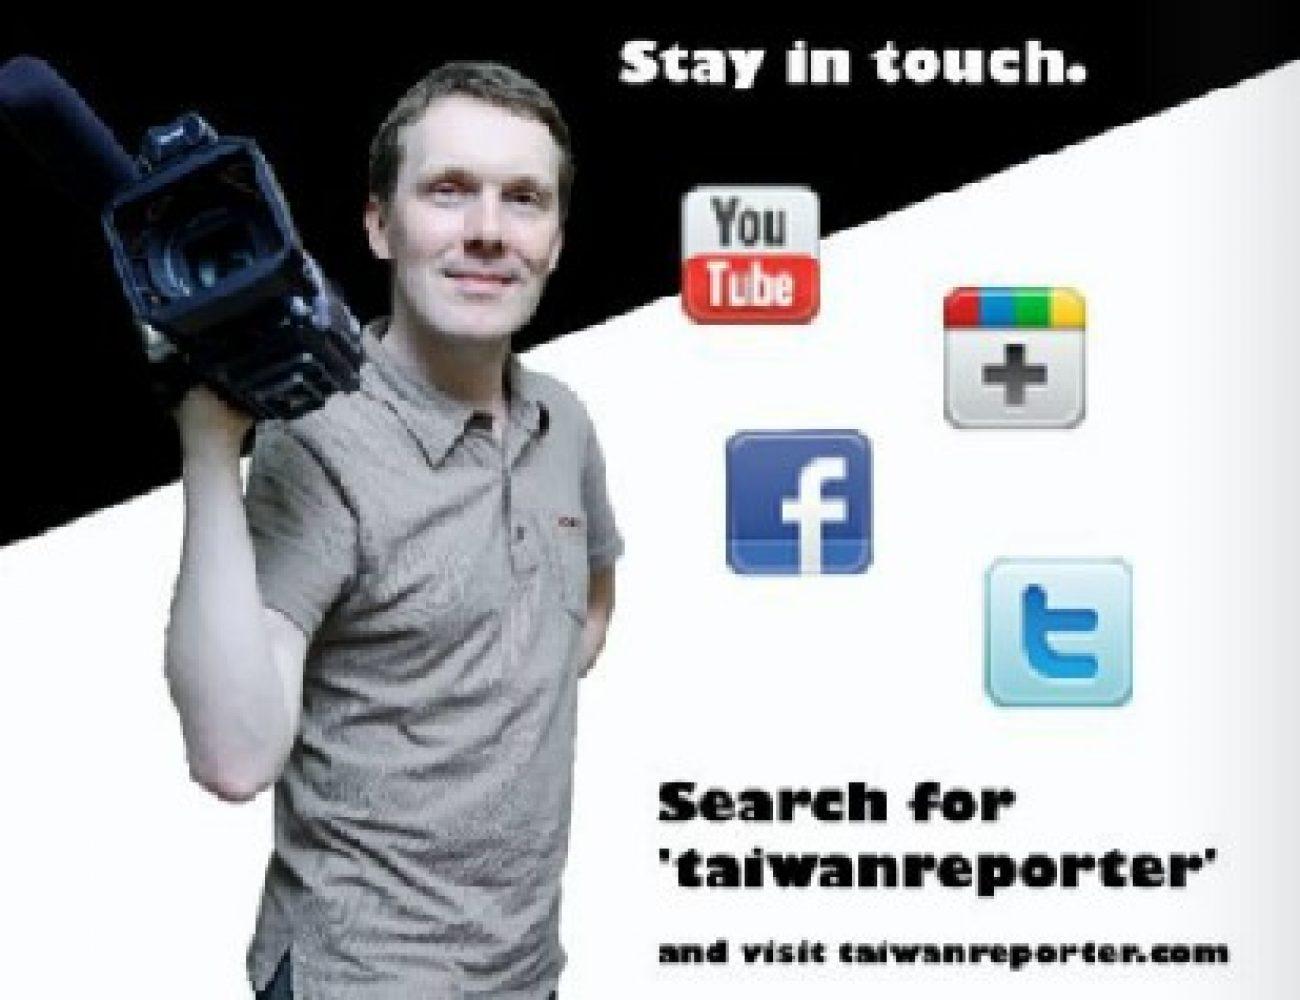 Social Media taiwanreporter